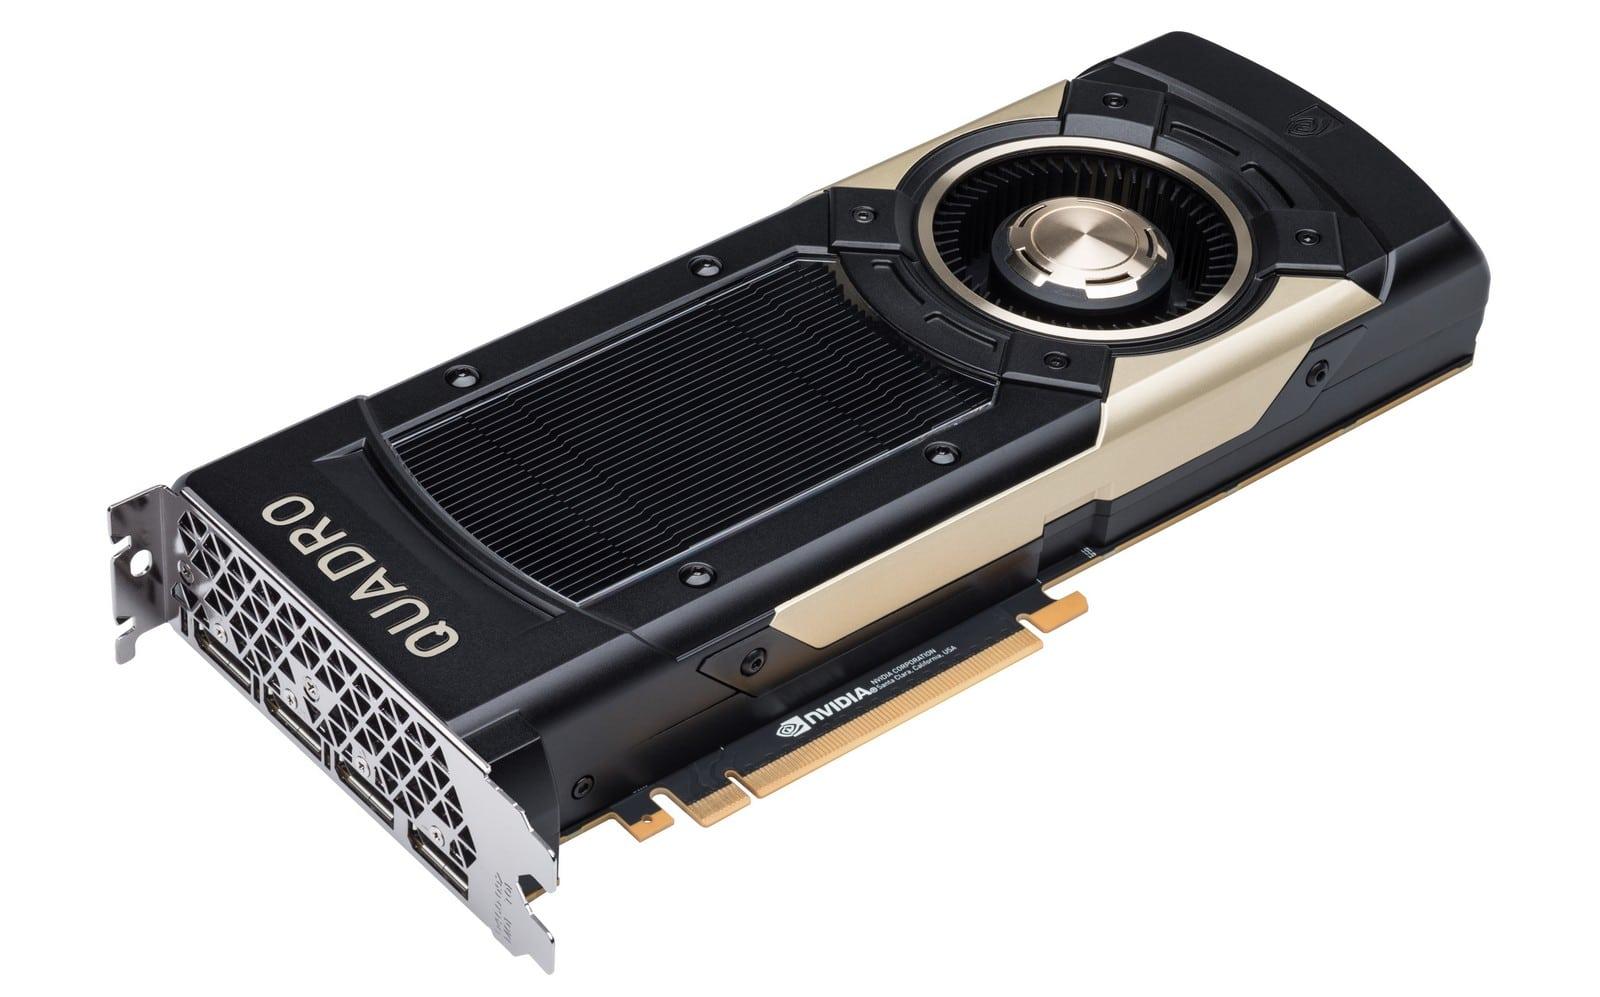 بطاقة Quadro GV100 بذاكرة 32GB HBM2